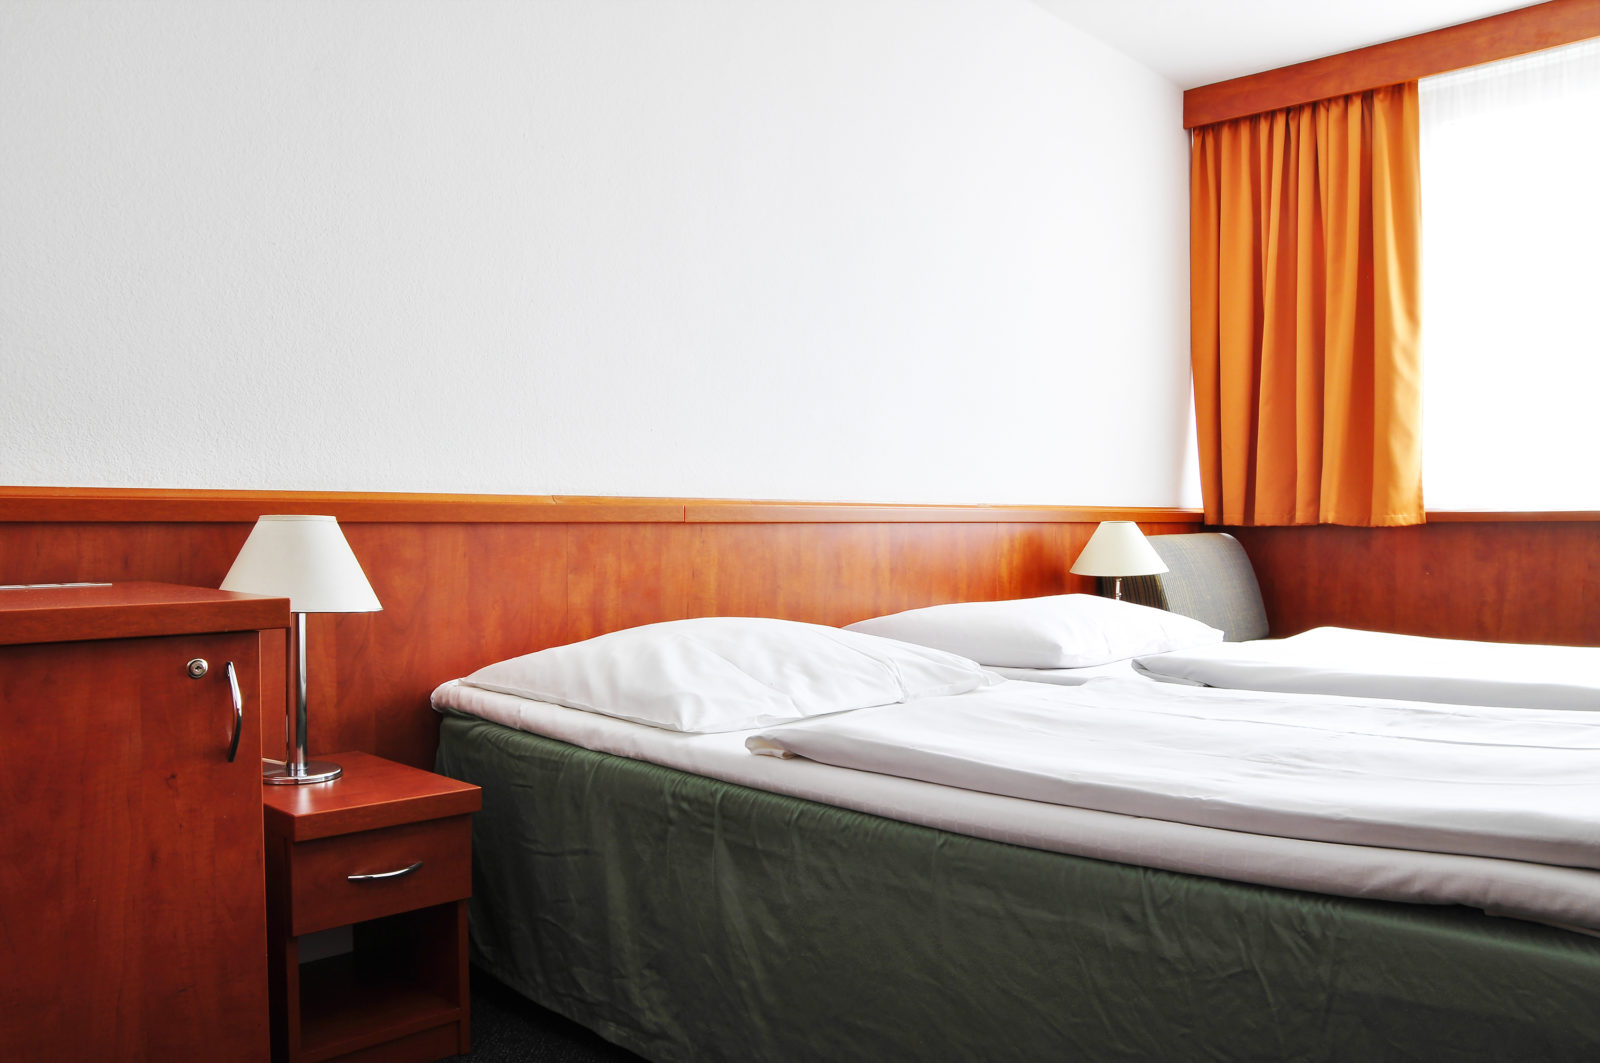 dw-tristar-rooms-max2-1600x1063